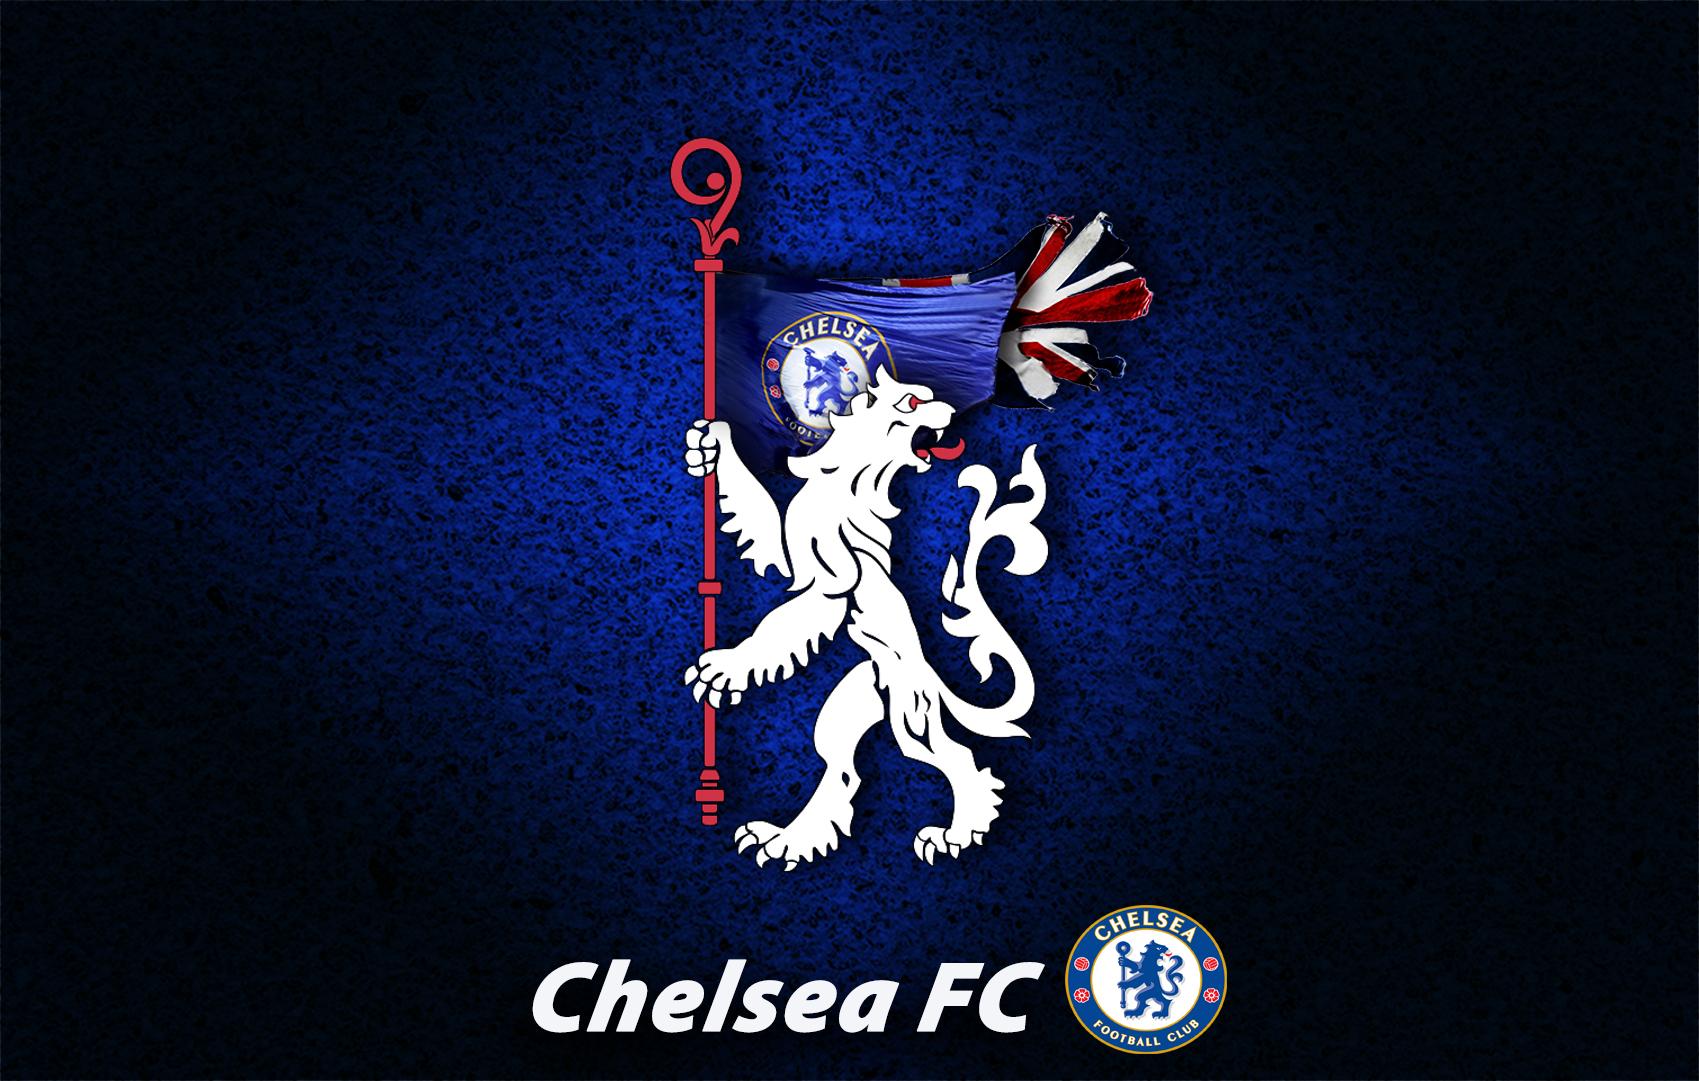 Chelsea FC WP White lion Logo   ImUnionjack Wallpaper 41685140 1699x1081